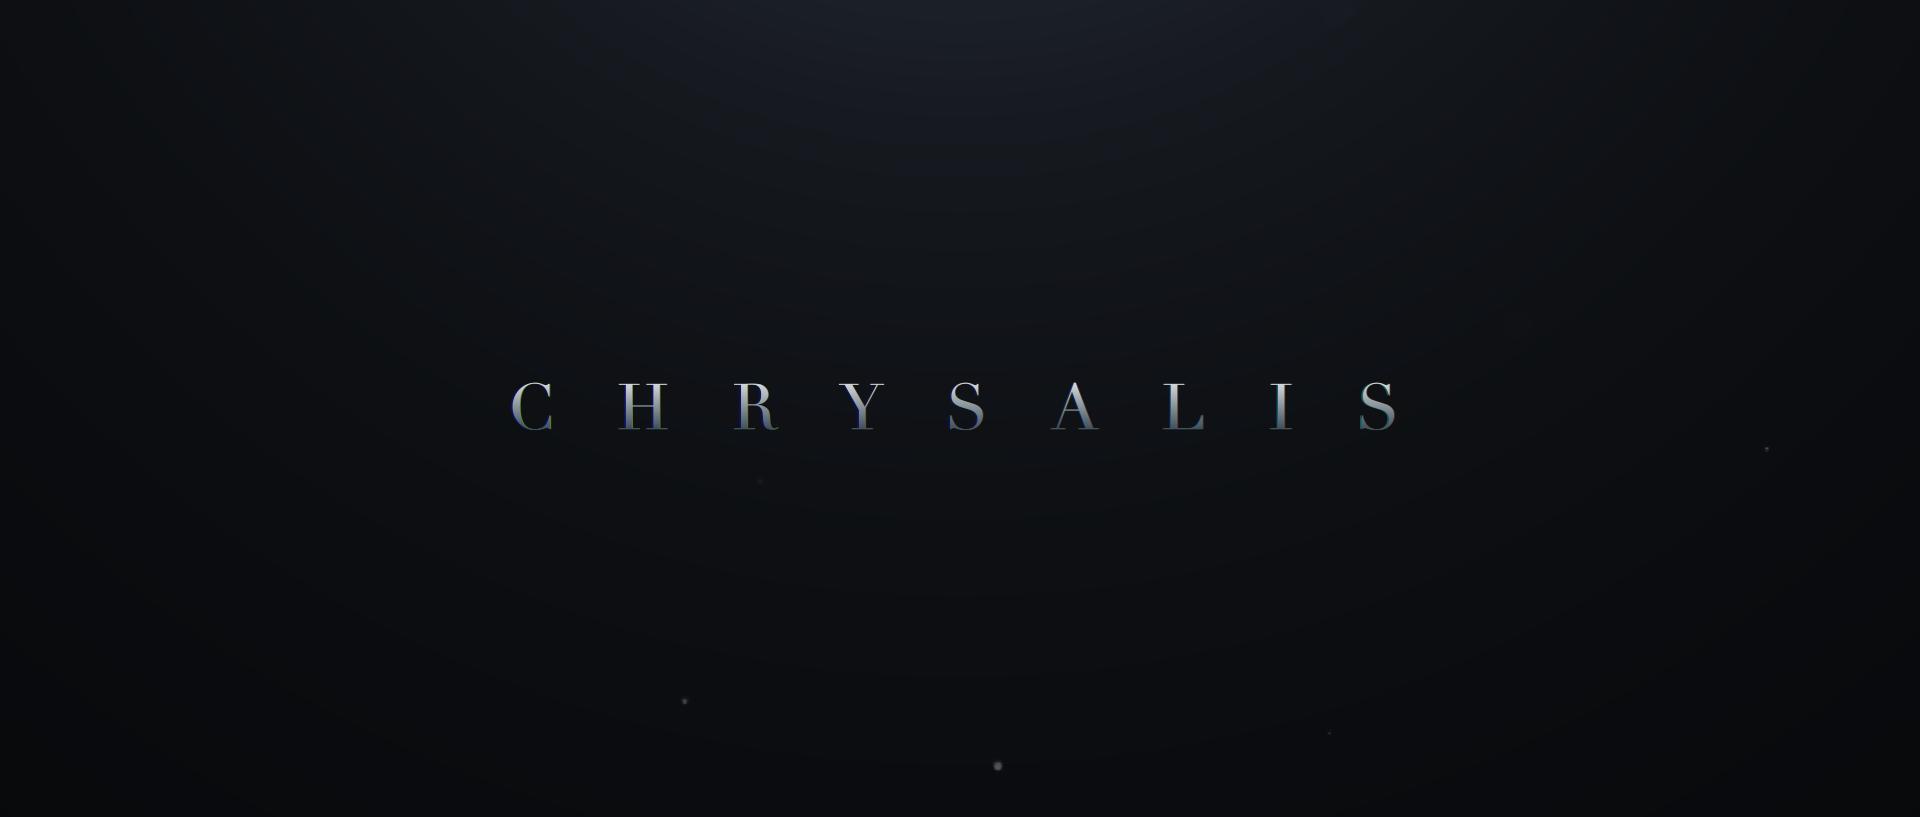 Chrysalis_0643.png